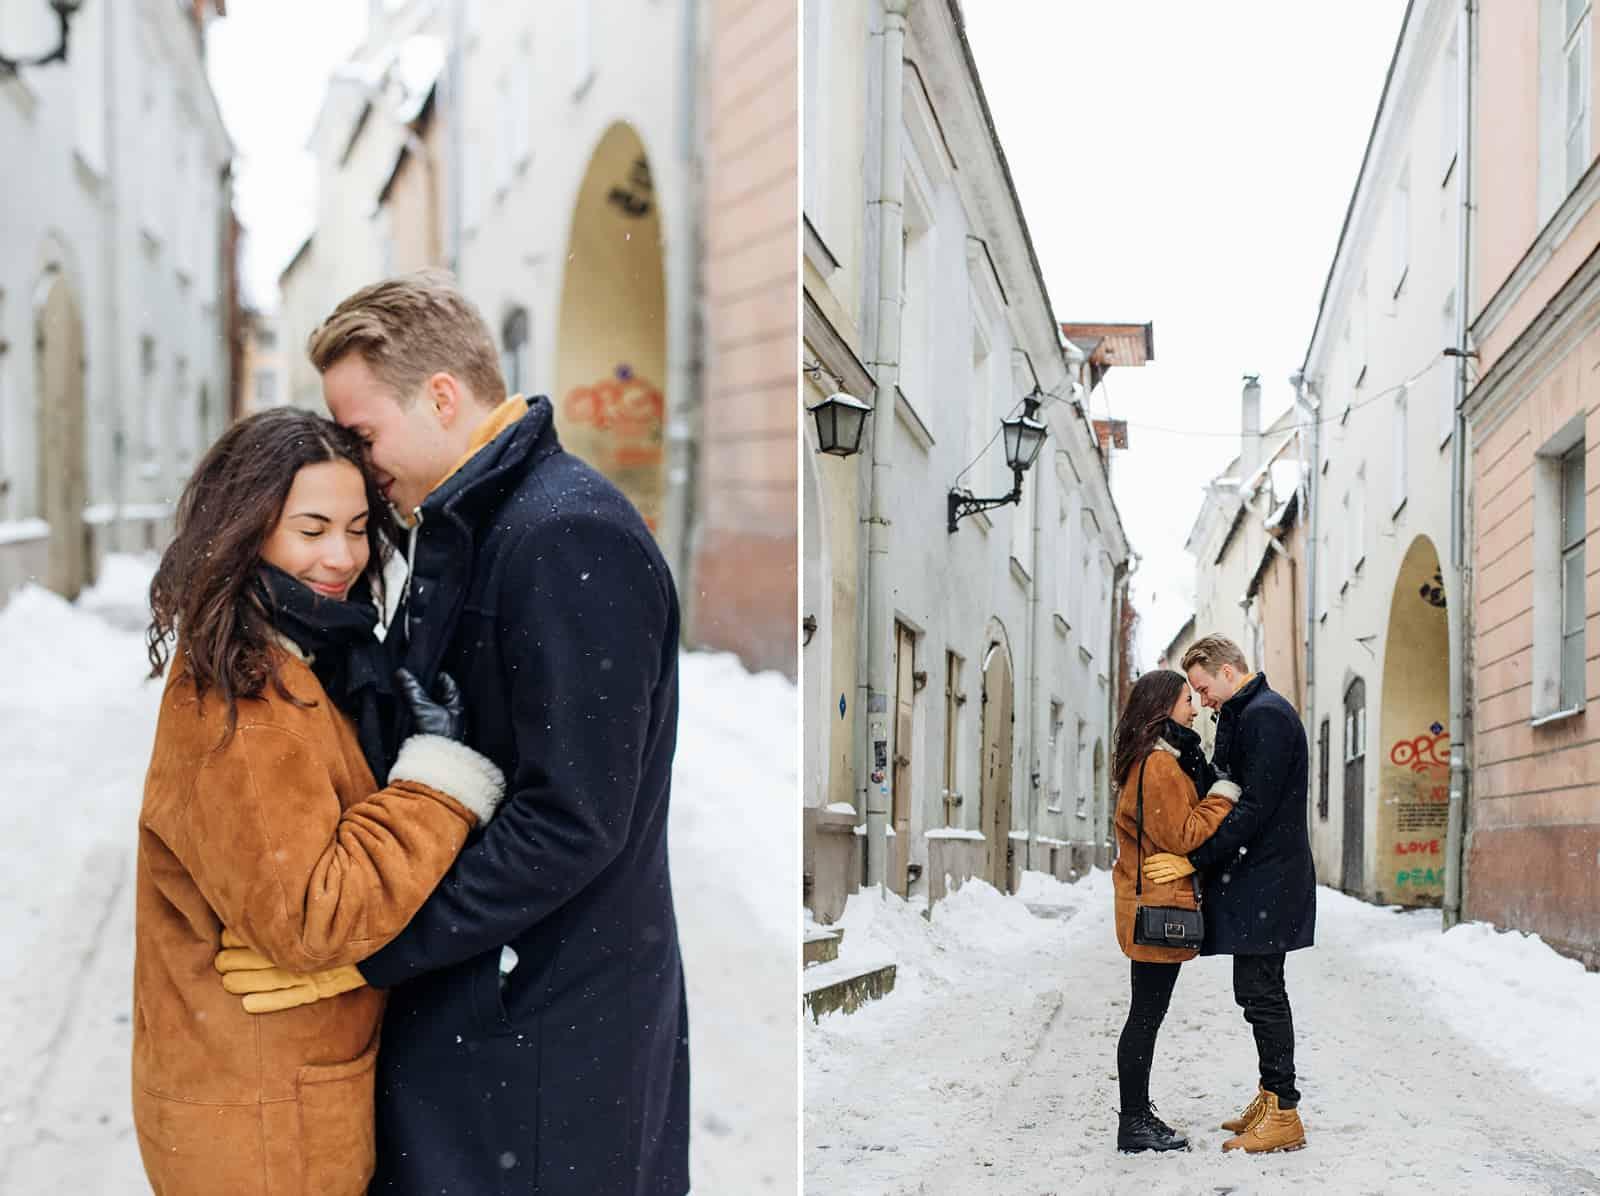 estonia engagement pictures, European city, travel photography